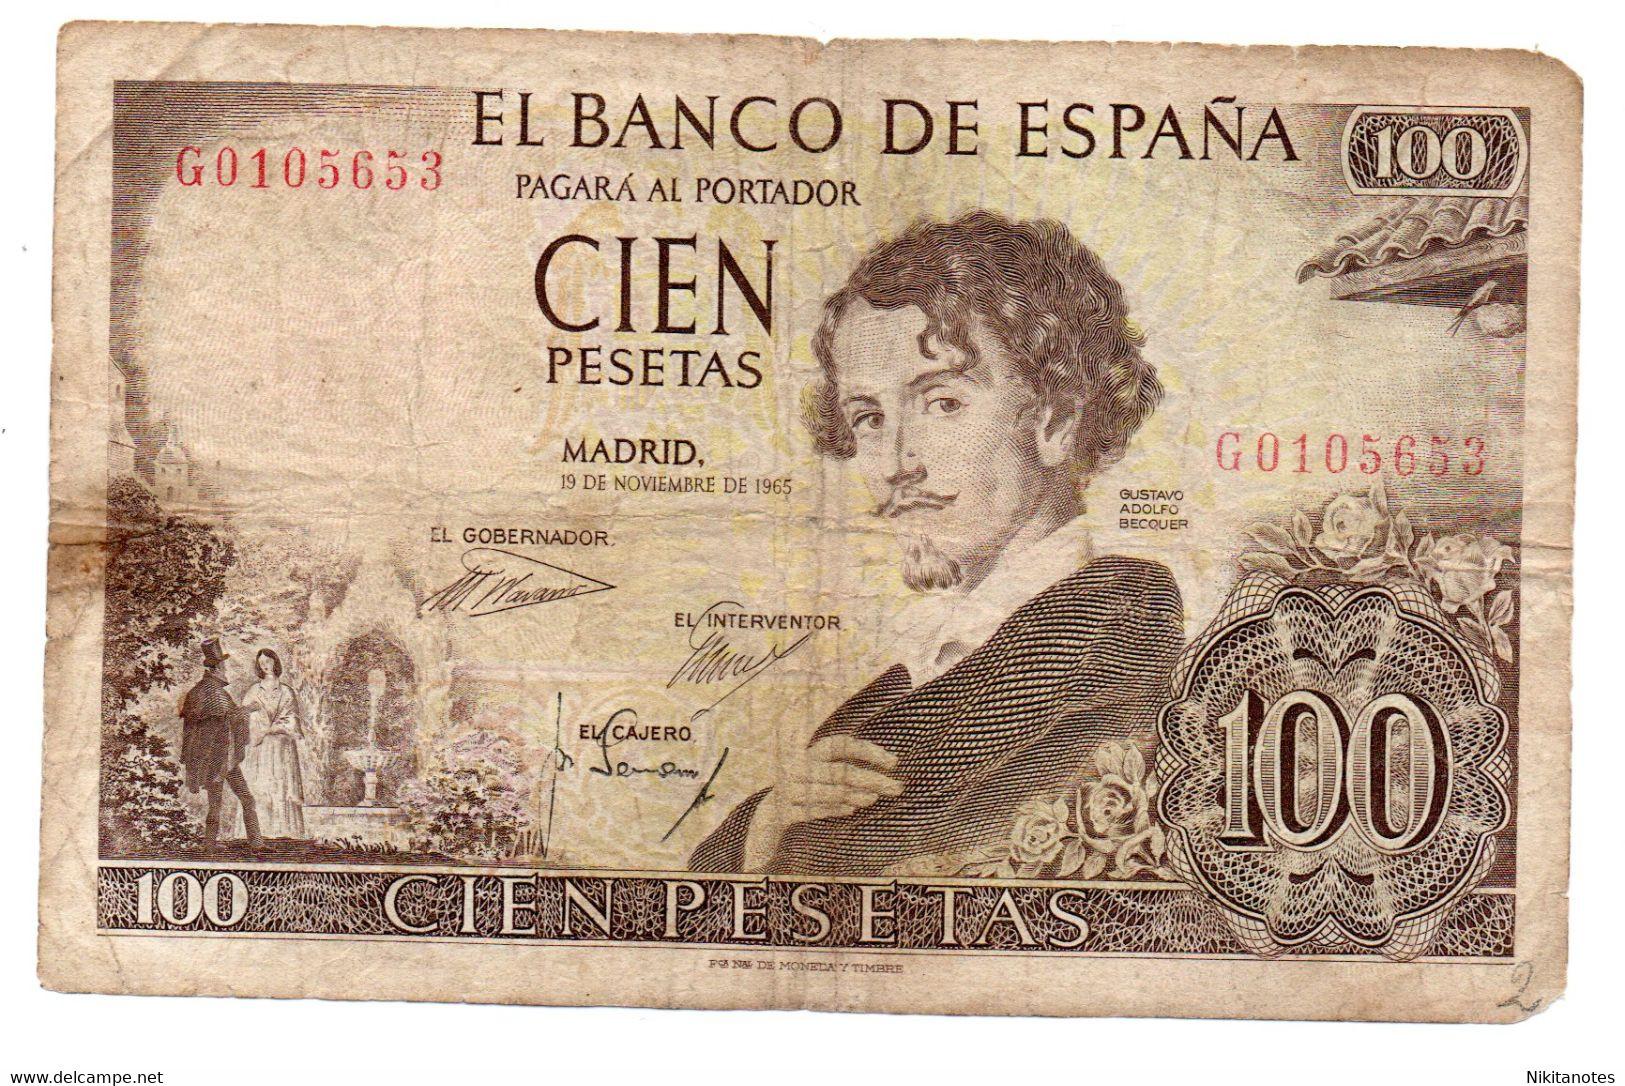 SPAIN 100 PESETAS 1965 P.150 GUSTAVO ADOLFO BECQUER - 100 Pesetas